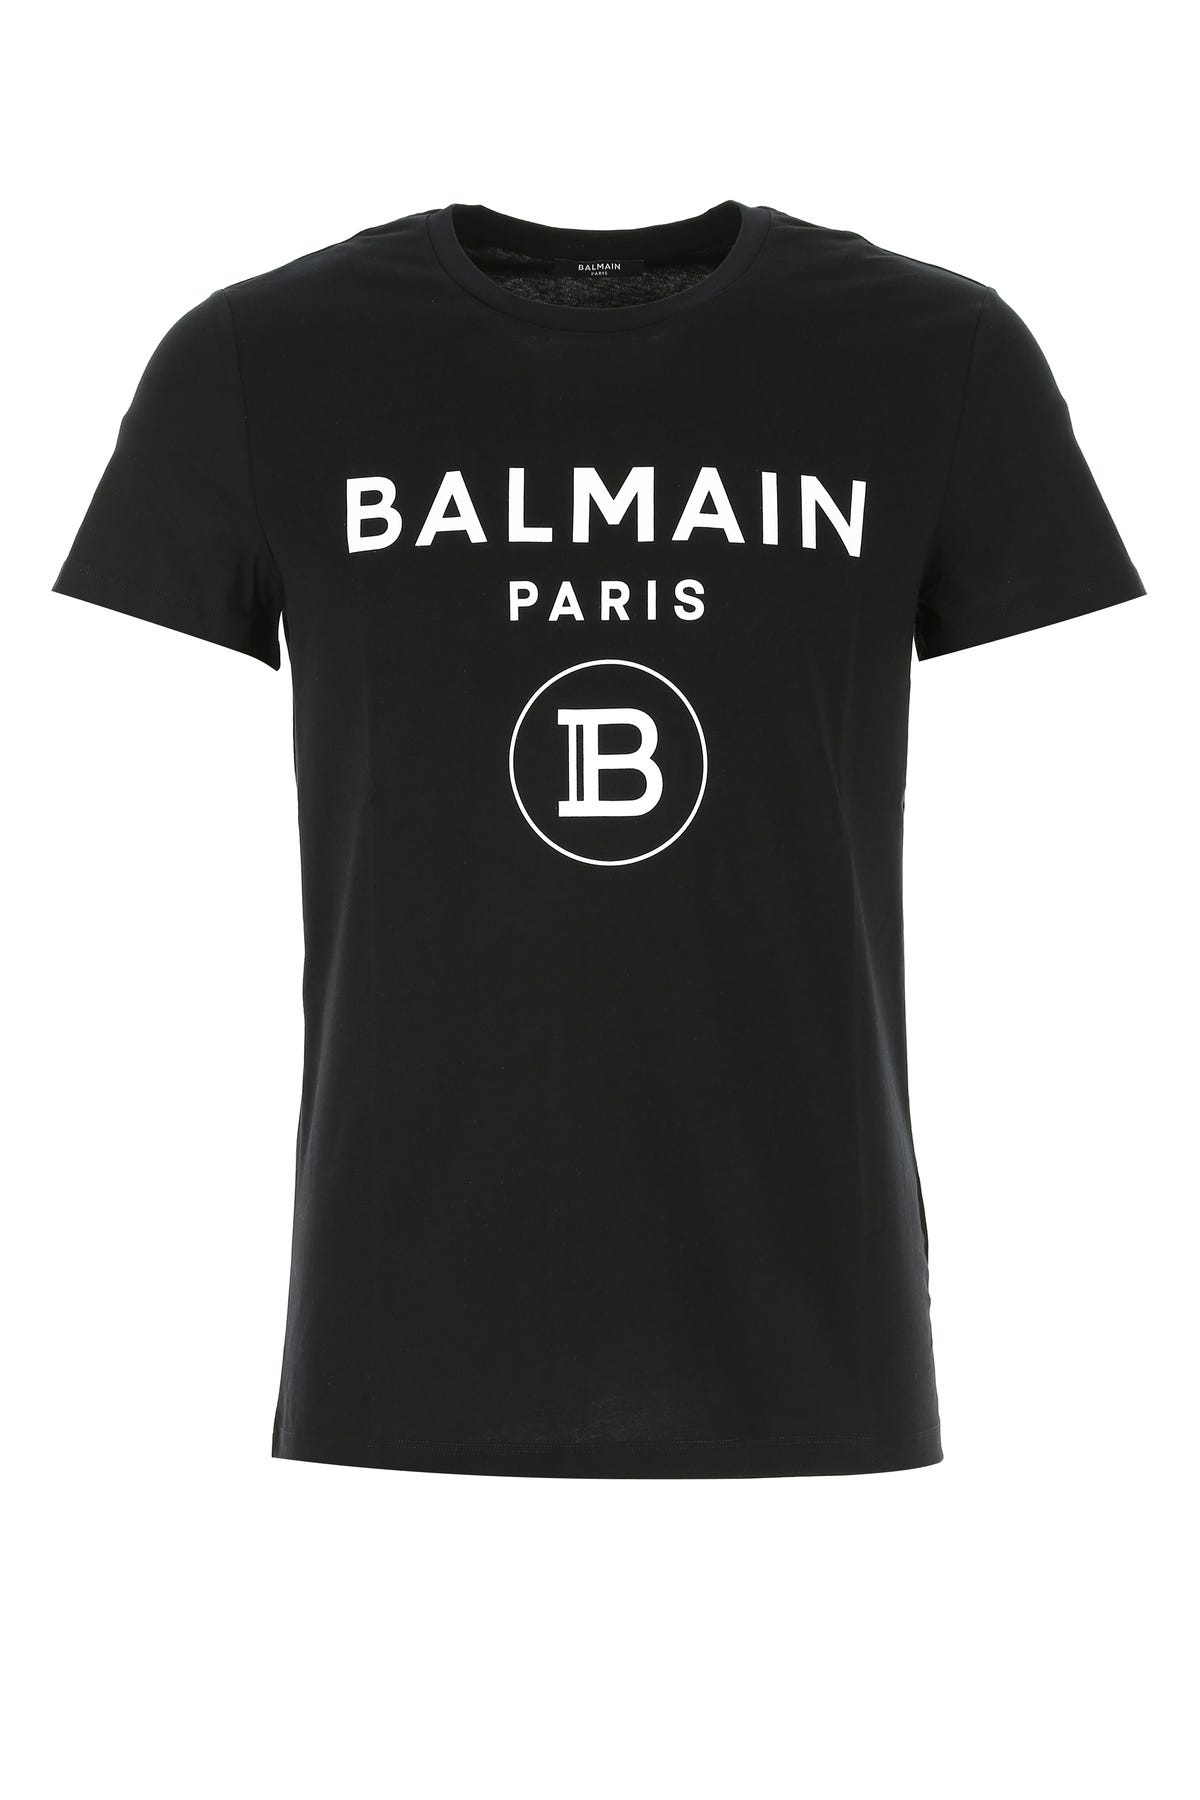 Balmain BLACK COTTON T-SHIRT  BLACK BALMAIN UOMO XL